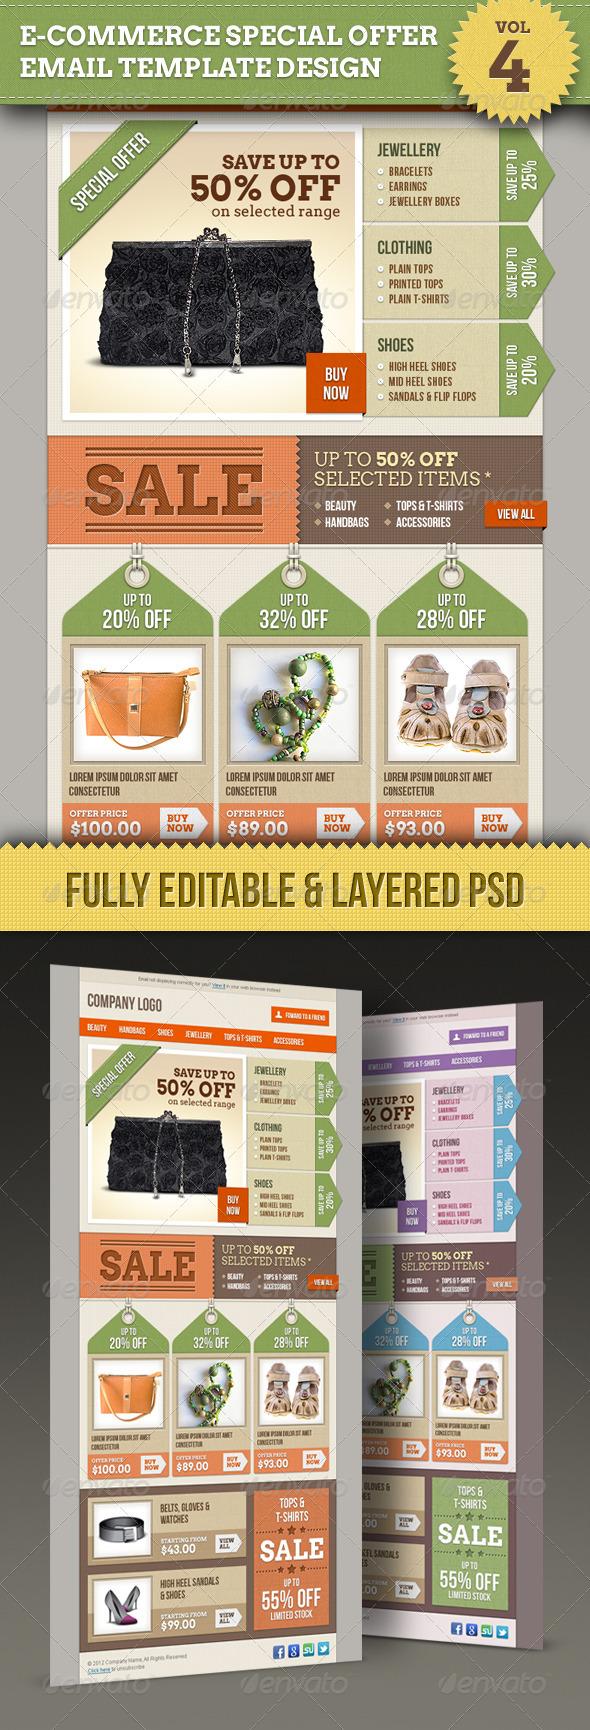 GraphicRiver E-commerce Offers Email Template Design Vol.4 1524638